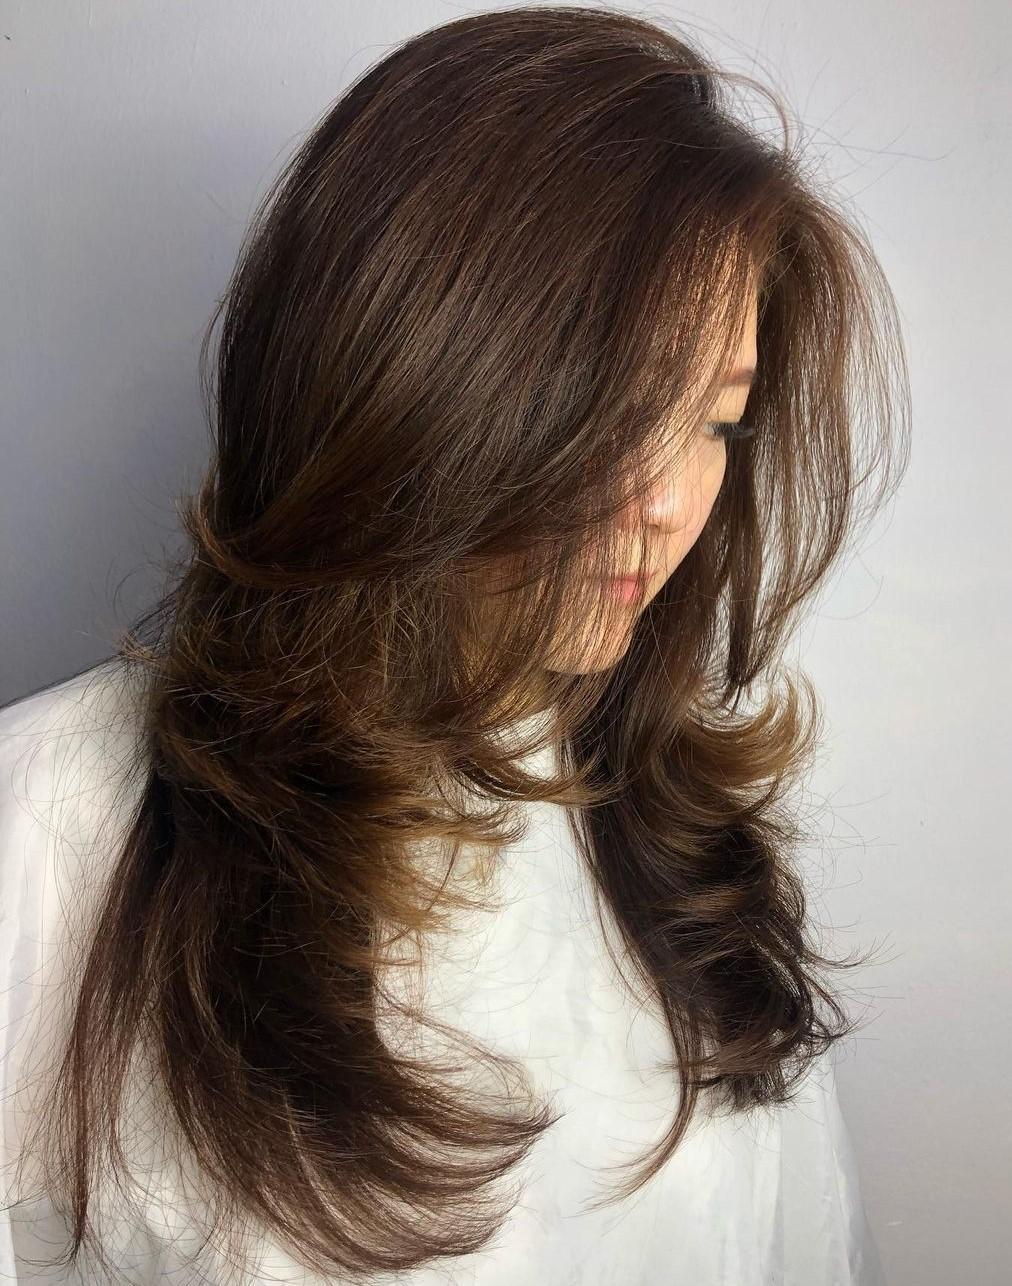 Asian Long Flipped Up Hair